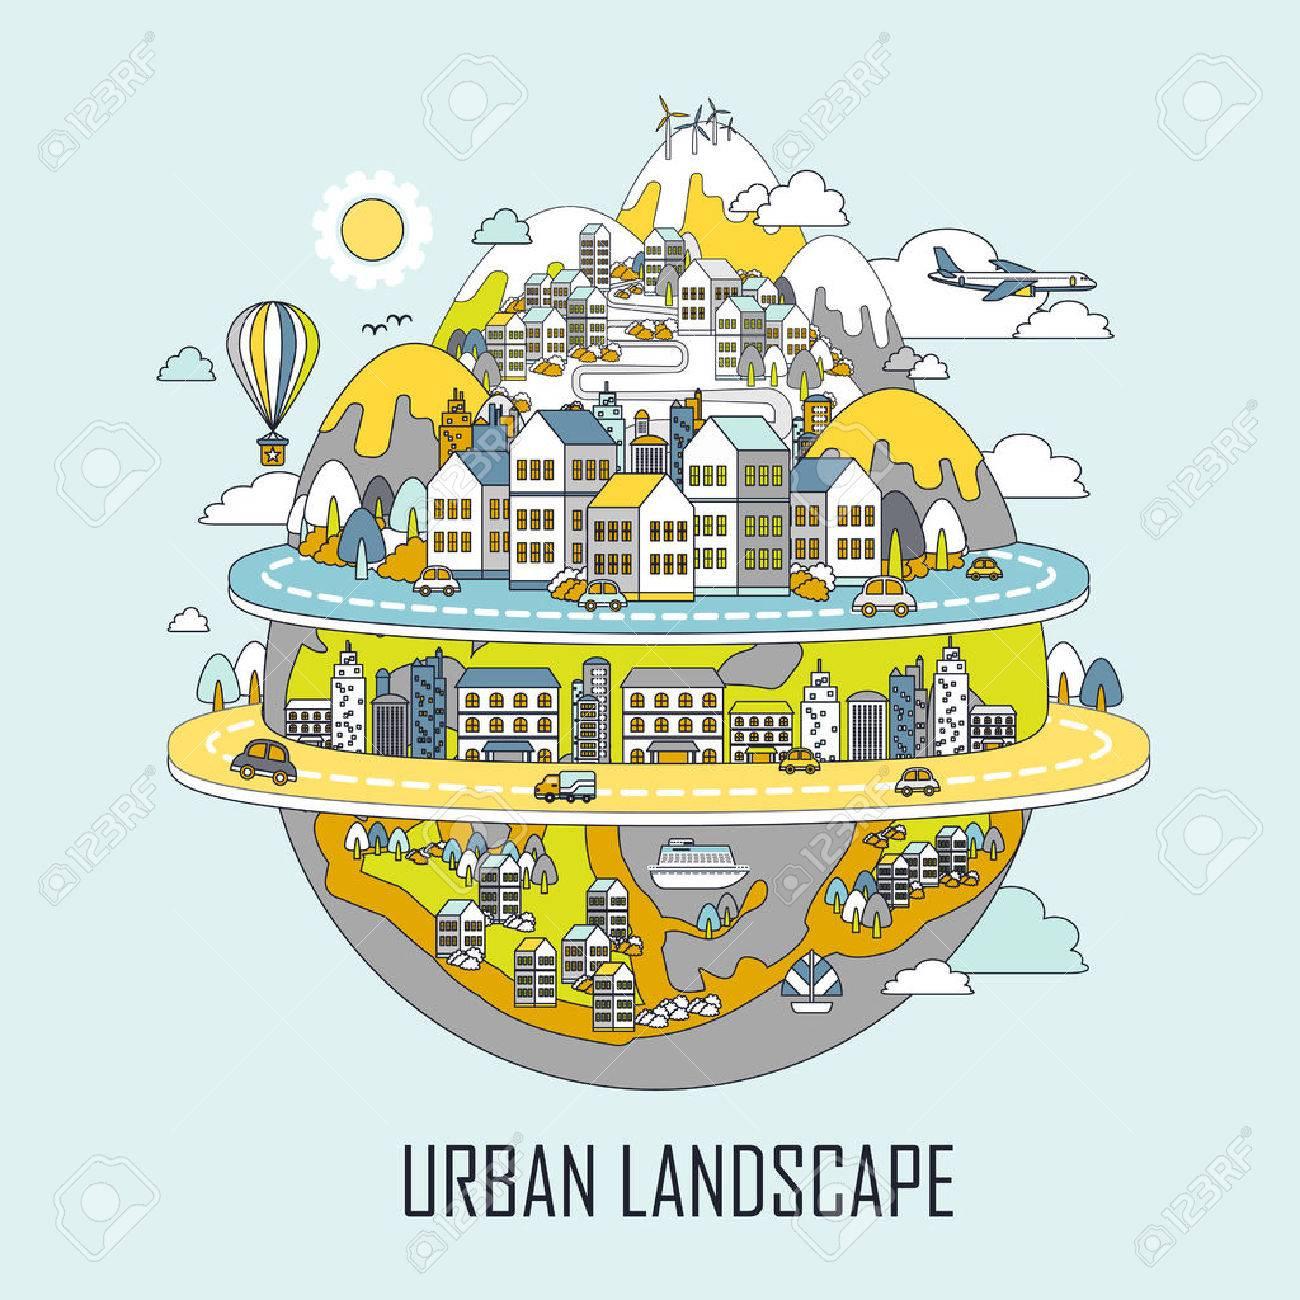 urban landscape concept: attractive city in line style - 41186987